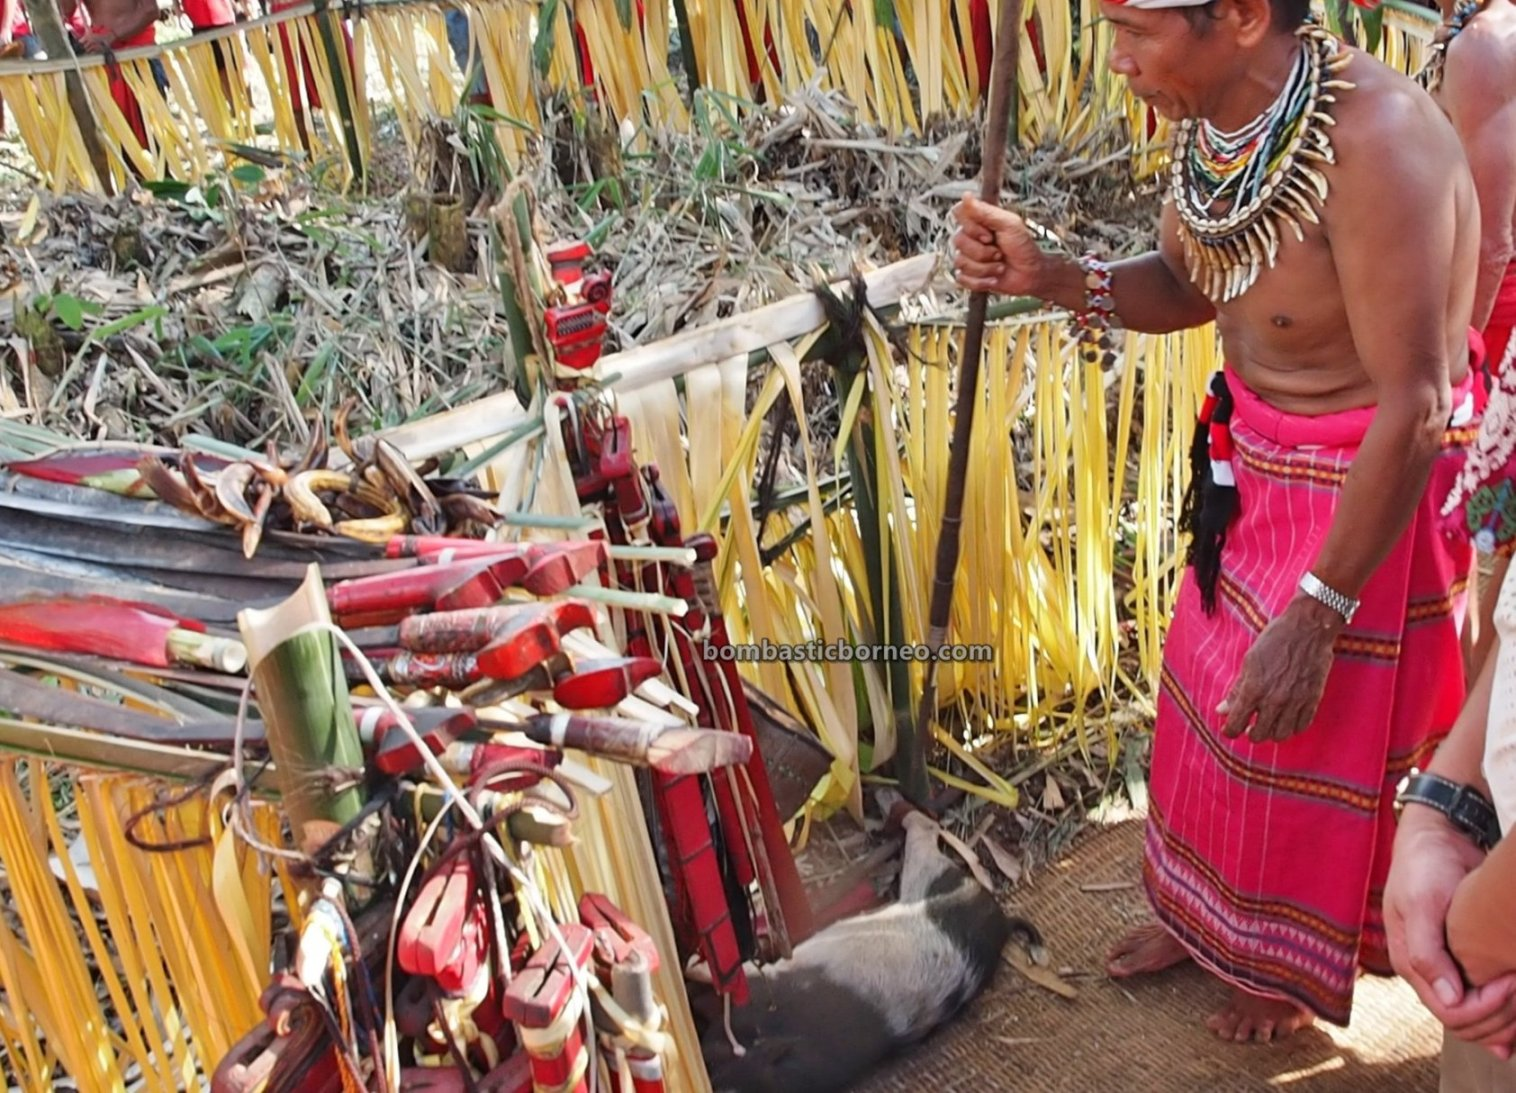 ritual, Nyobeng Rambai, Gawai Harvest Festival, authentic, backpackers, Indonesia, Bengkayang, Desa Sahan, Dayak Bidayuh, Native, Tourism, tourist attraction, cross border, 印尼西加里曼丹, 婆罗洲达雅丰收节日, 比达友族传统文化